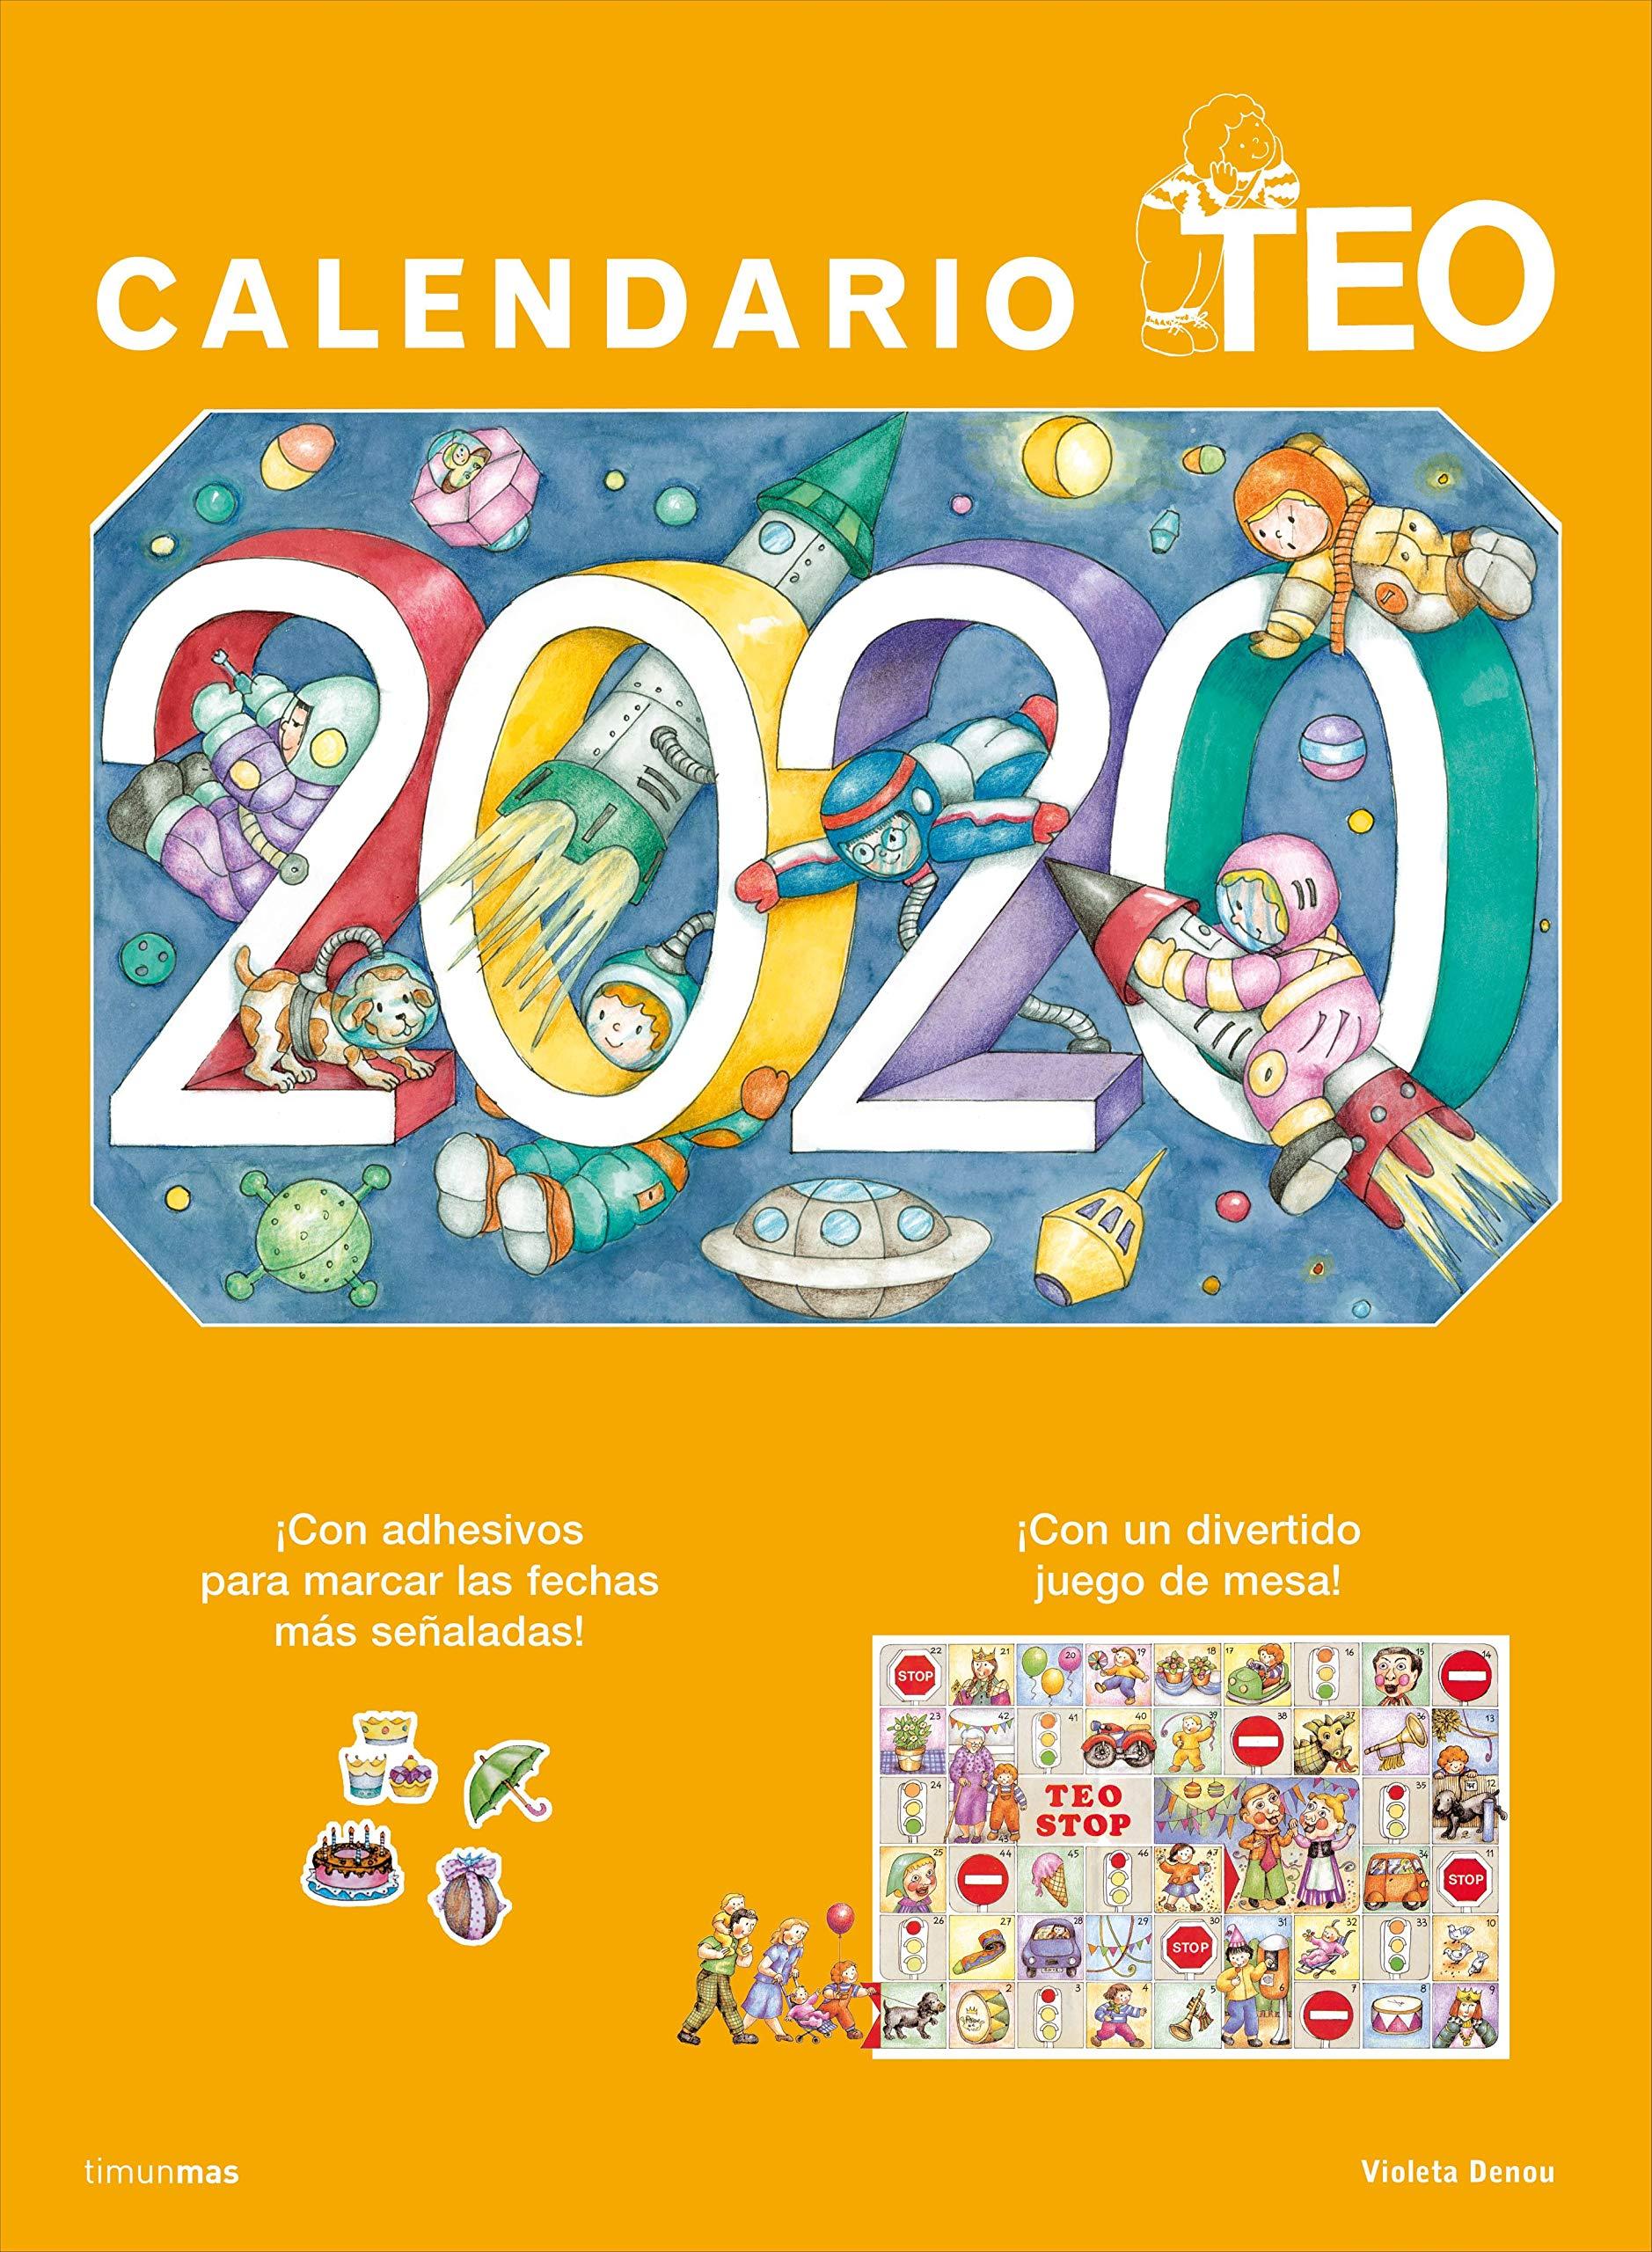 Calendario Teo 2020 Libros Especiales De Teo Spanish Edition Denou Violeta 9788408213758 Books